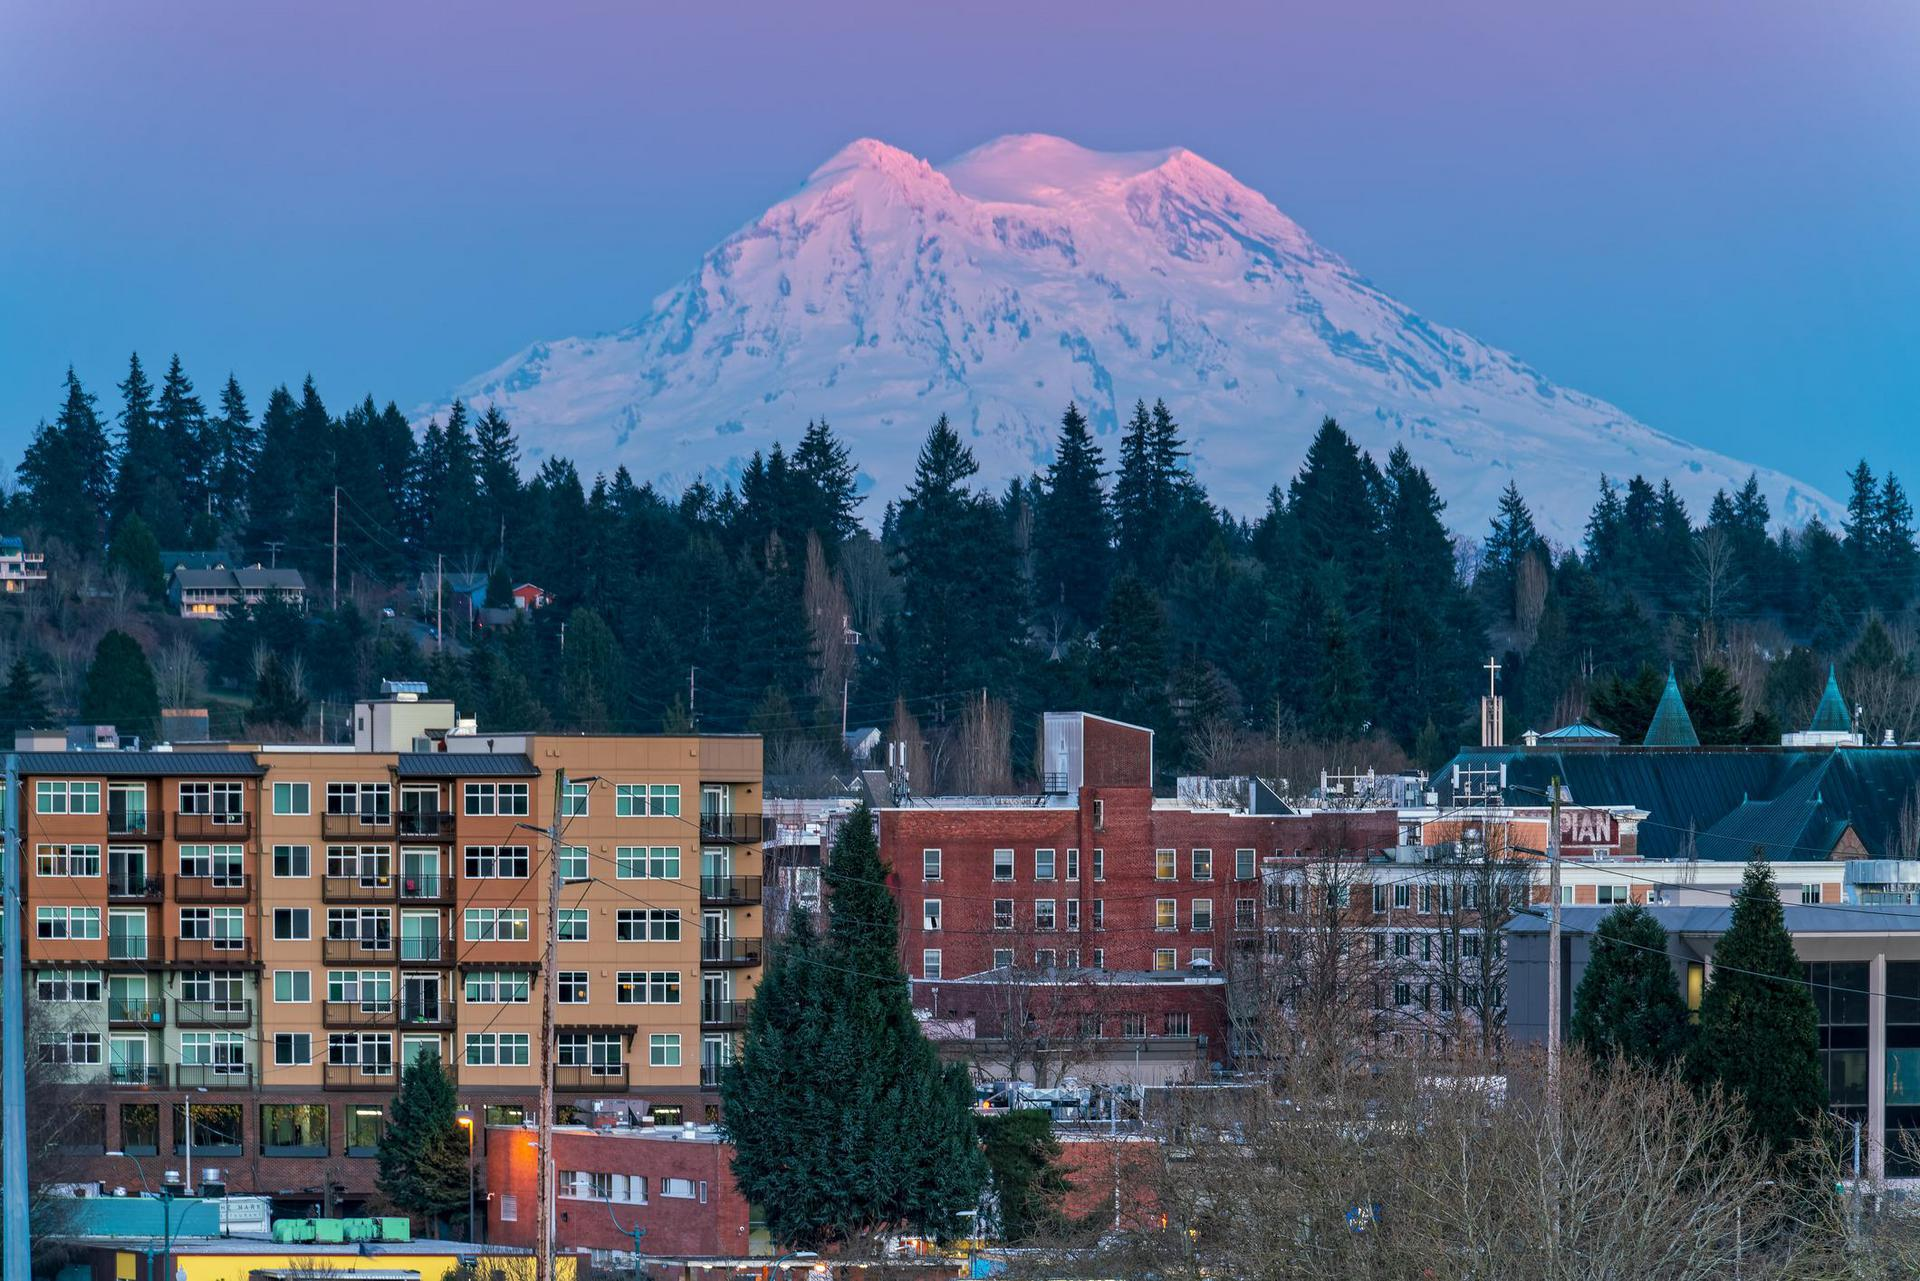 Washington Background Checks - state-background-check-featured-image